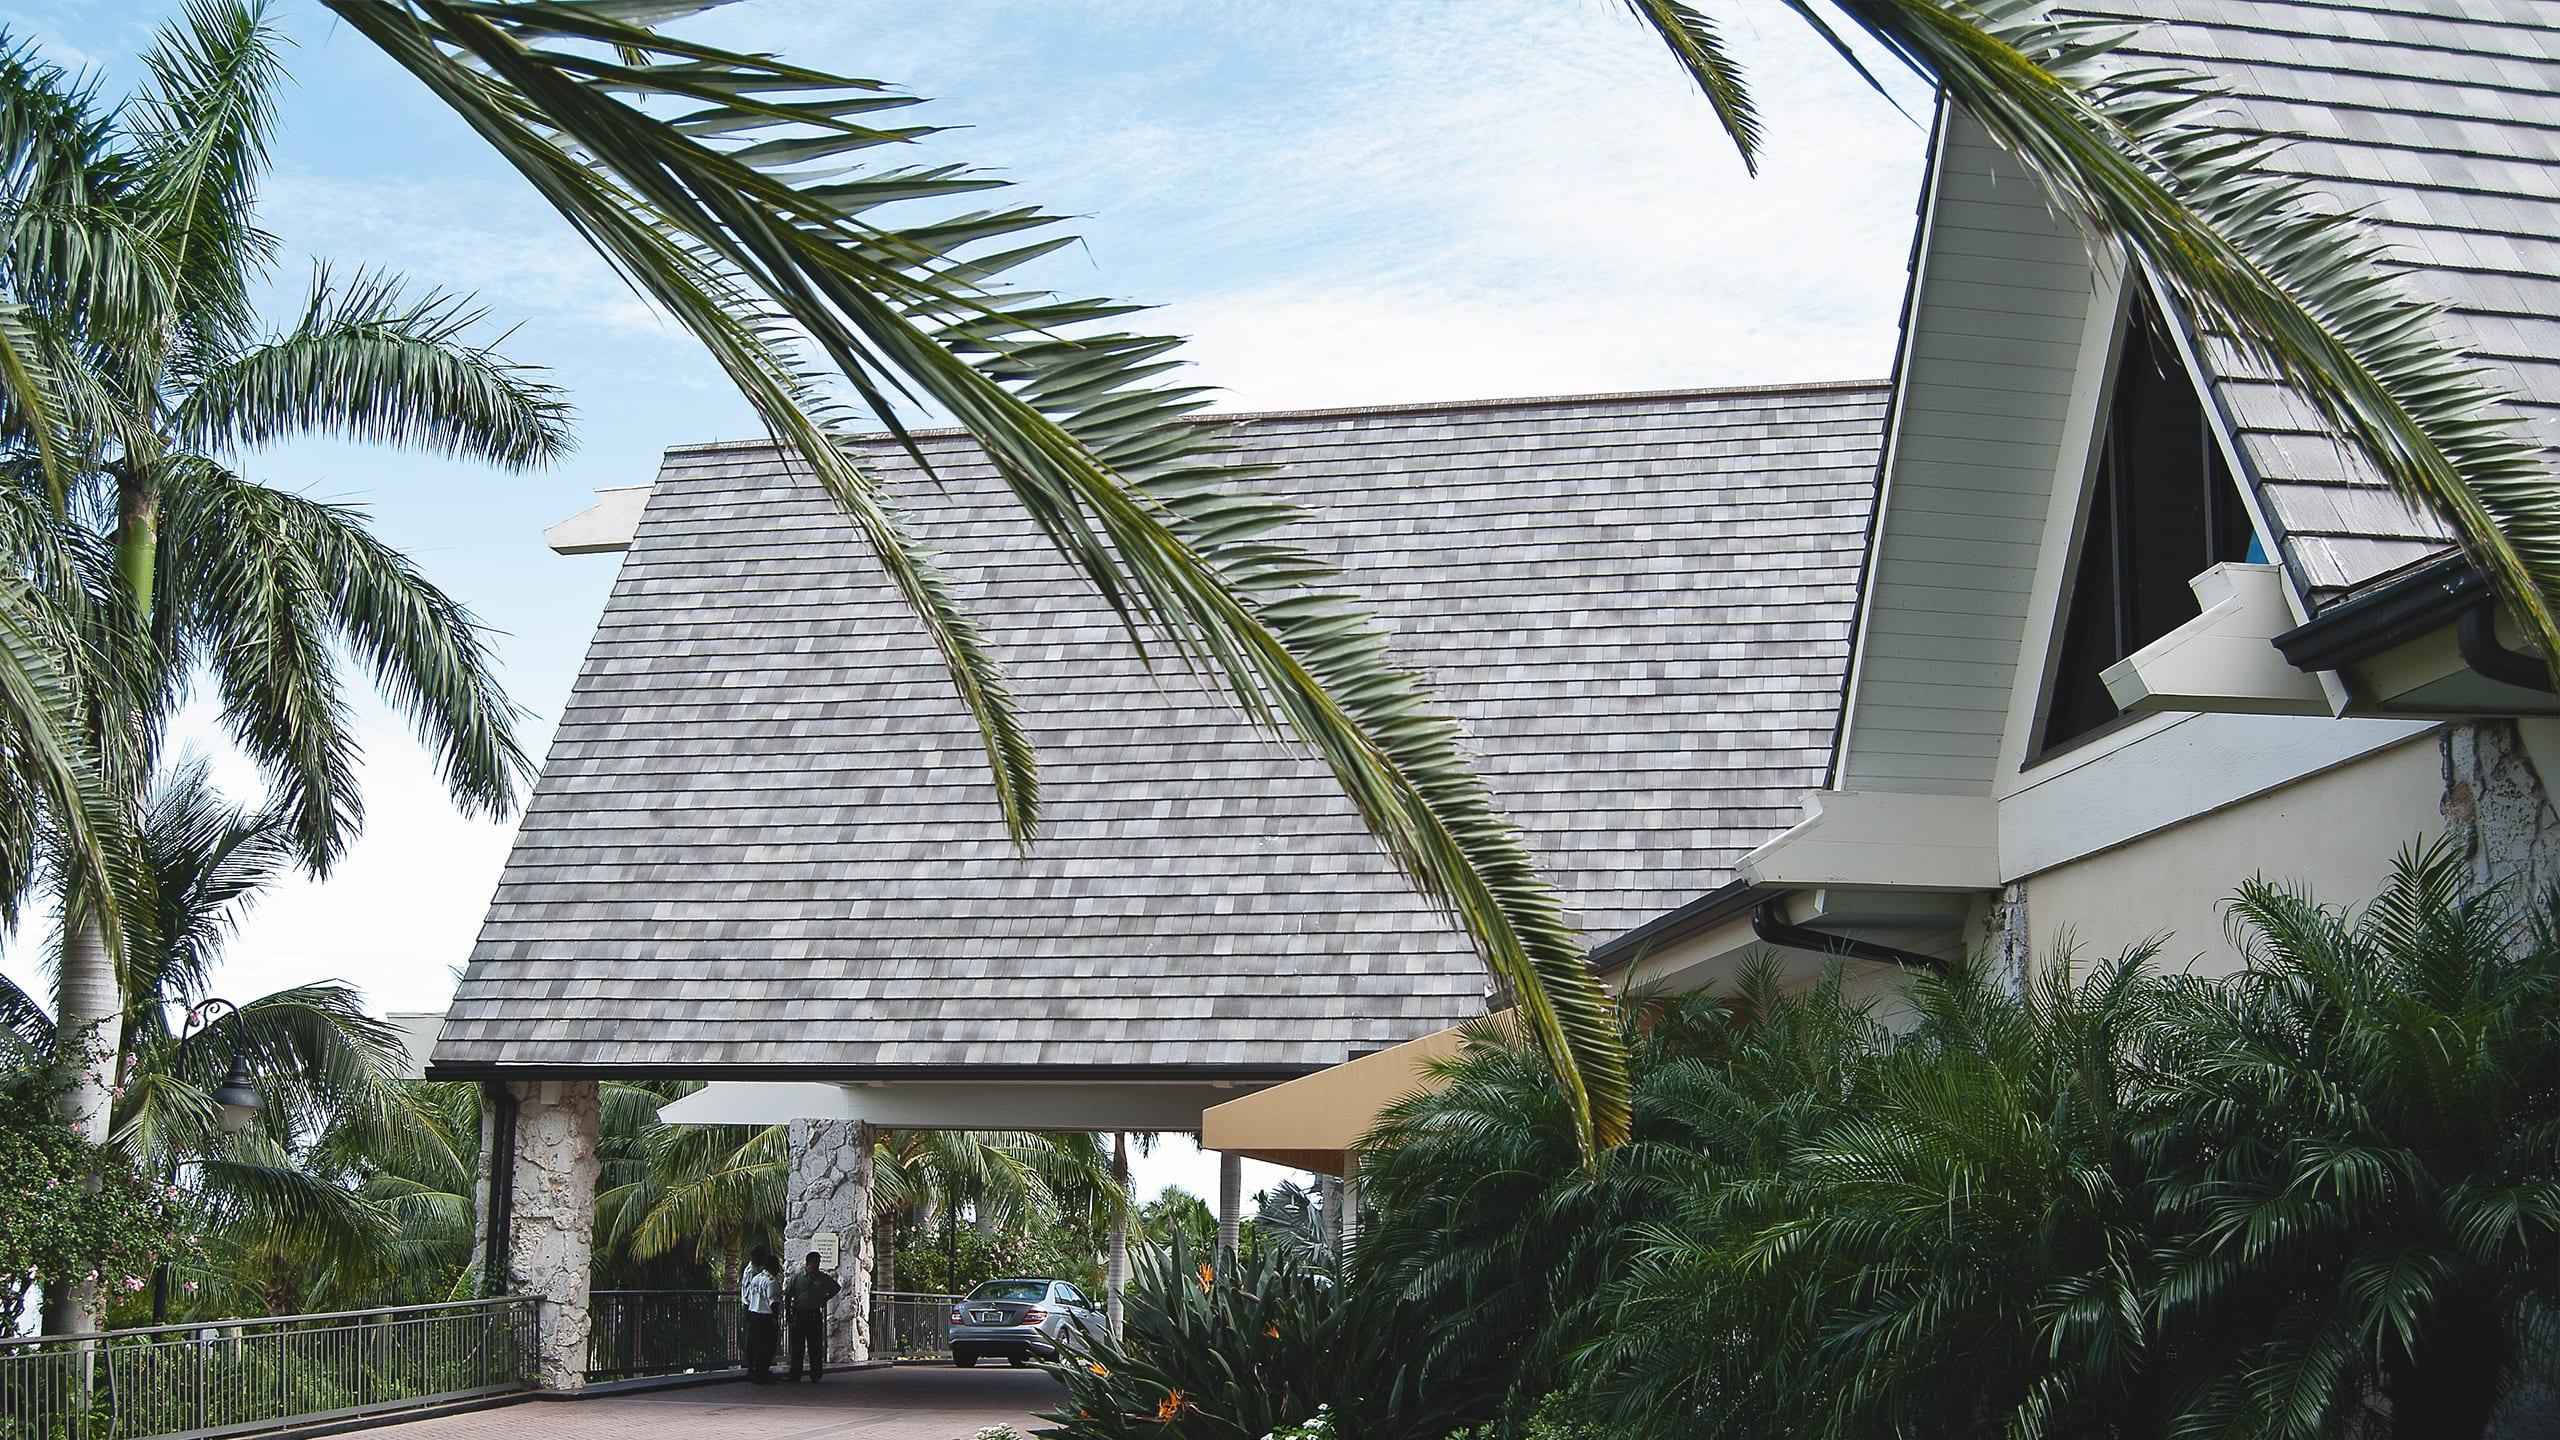 Marco Island Marriott Ludowici Roof Tile